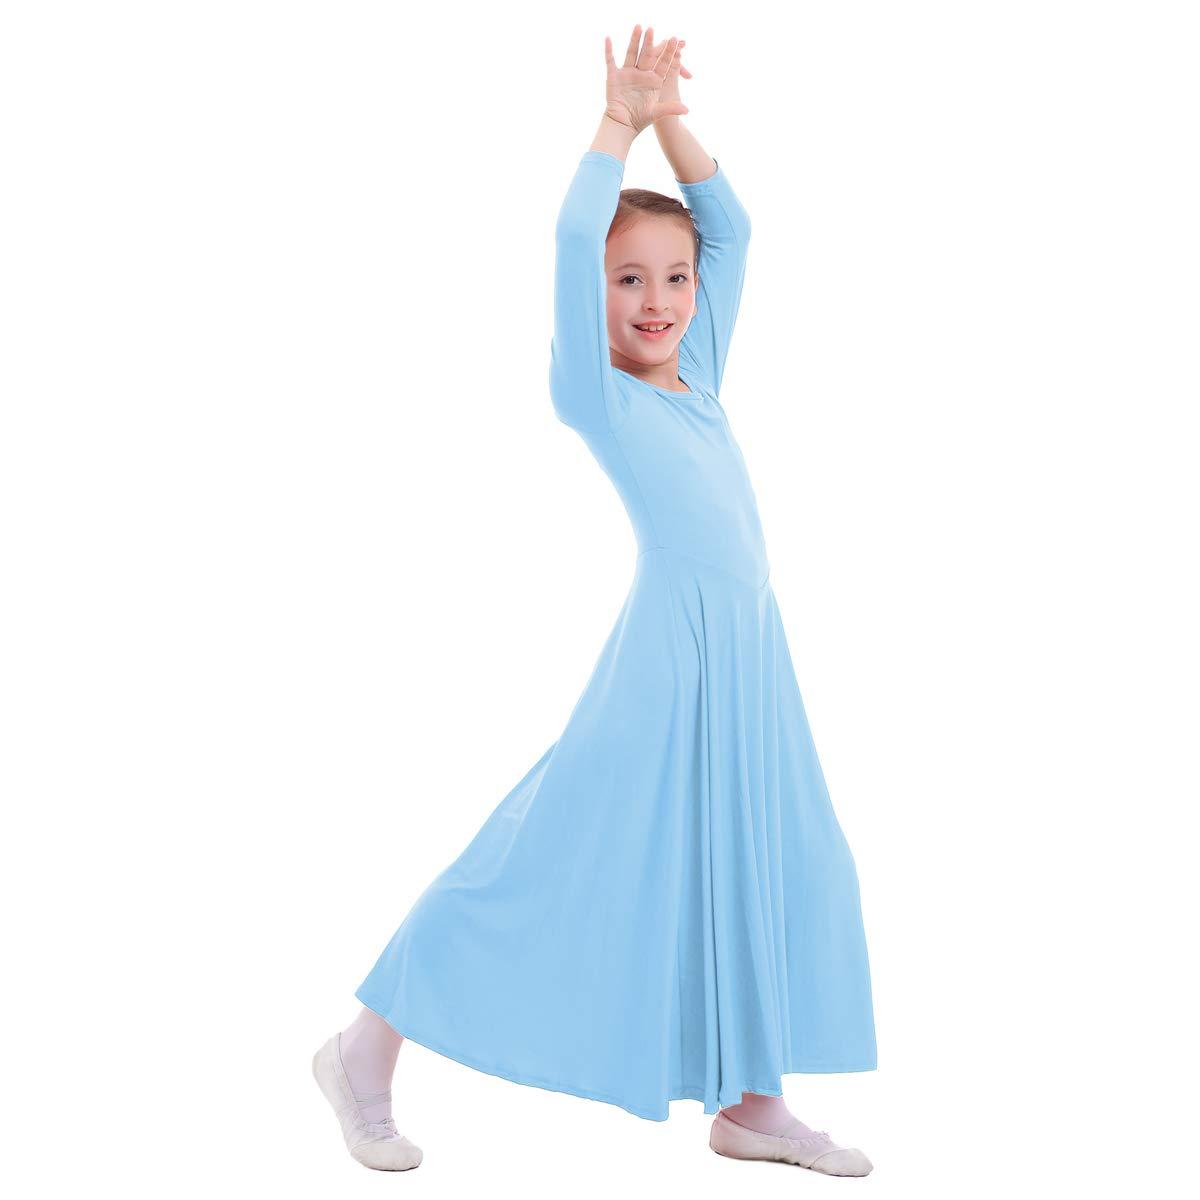 Kid Girls Liturgical Praise Lyrical Dance Loose Fit Long Sleeve Ruffled Dress Full Length Soft Plain Dancewear Worship Costume 3-14 Years